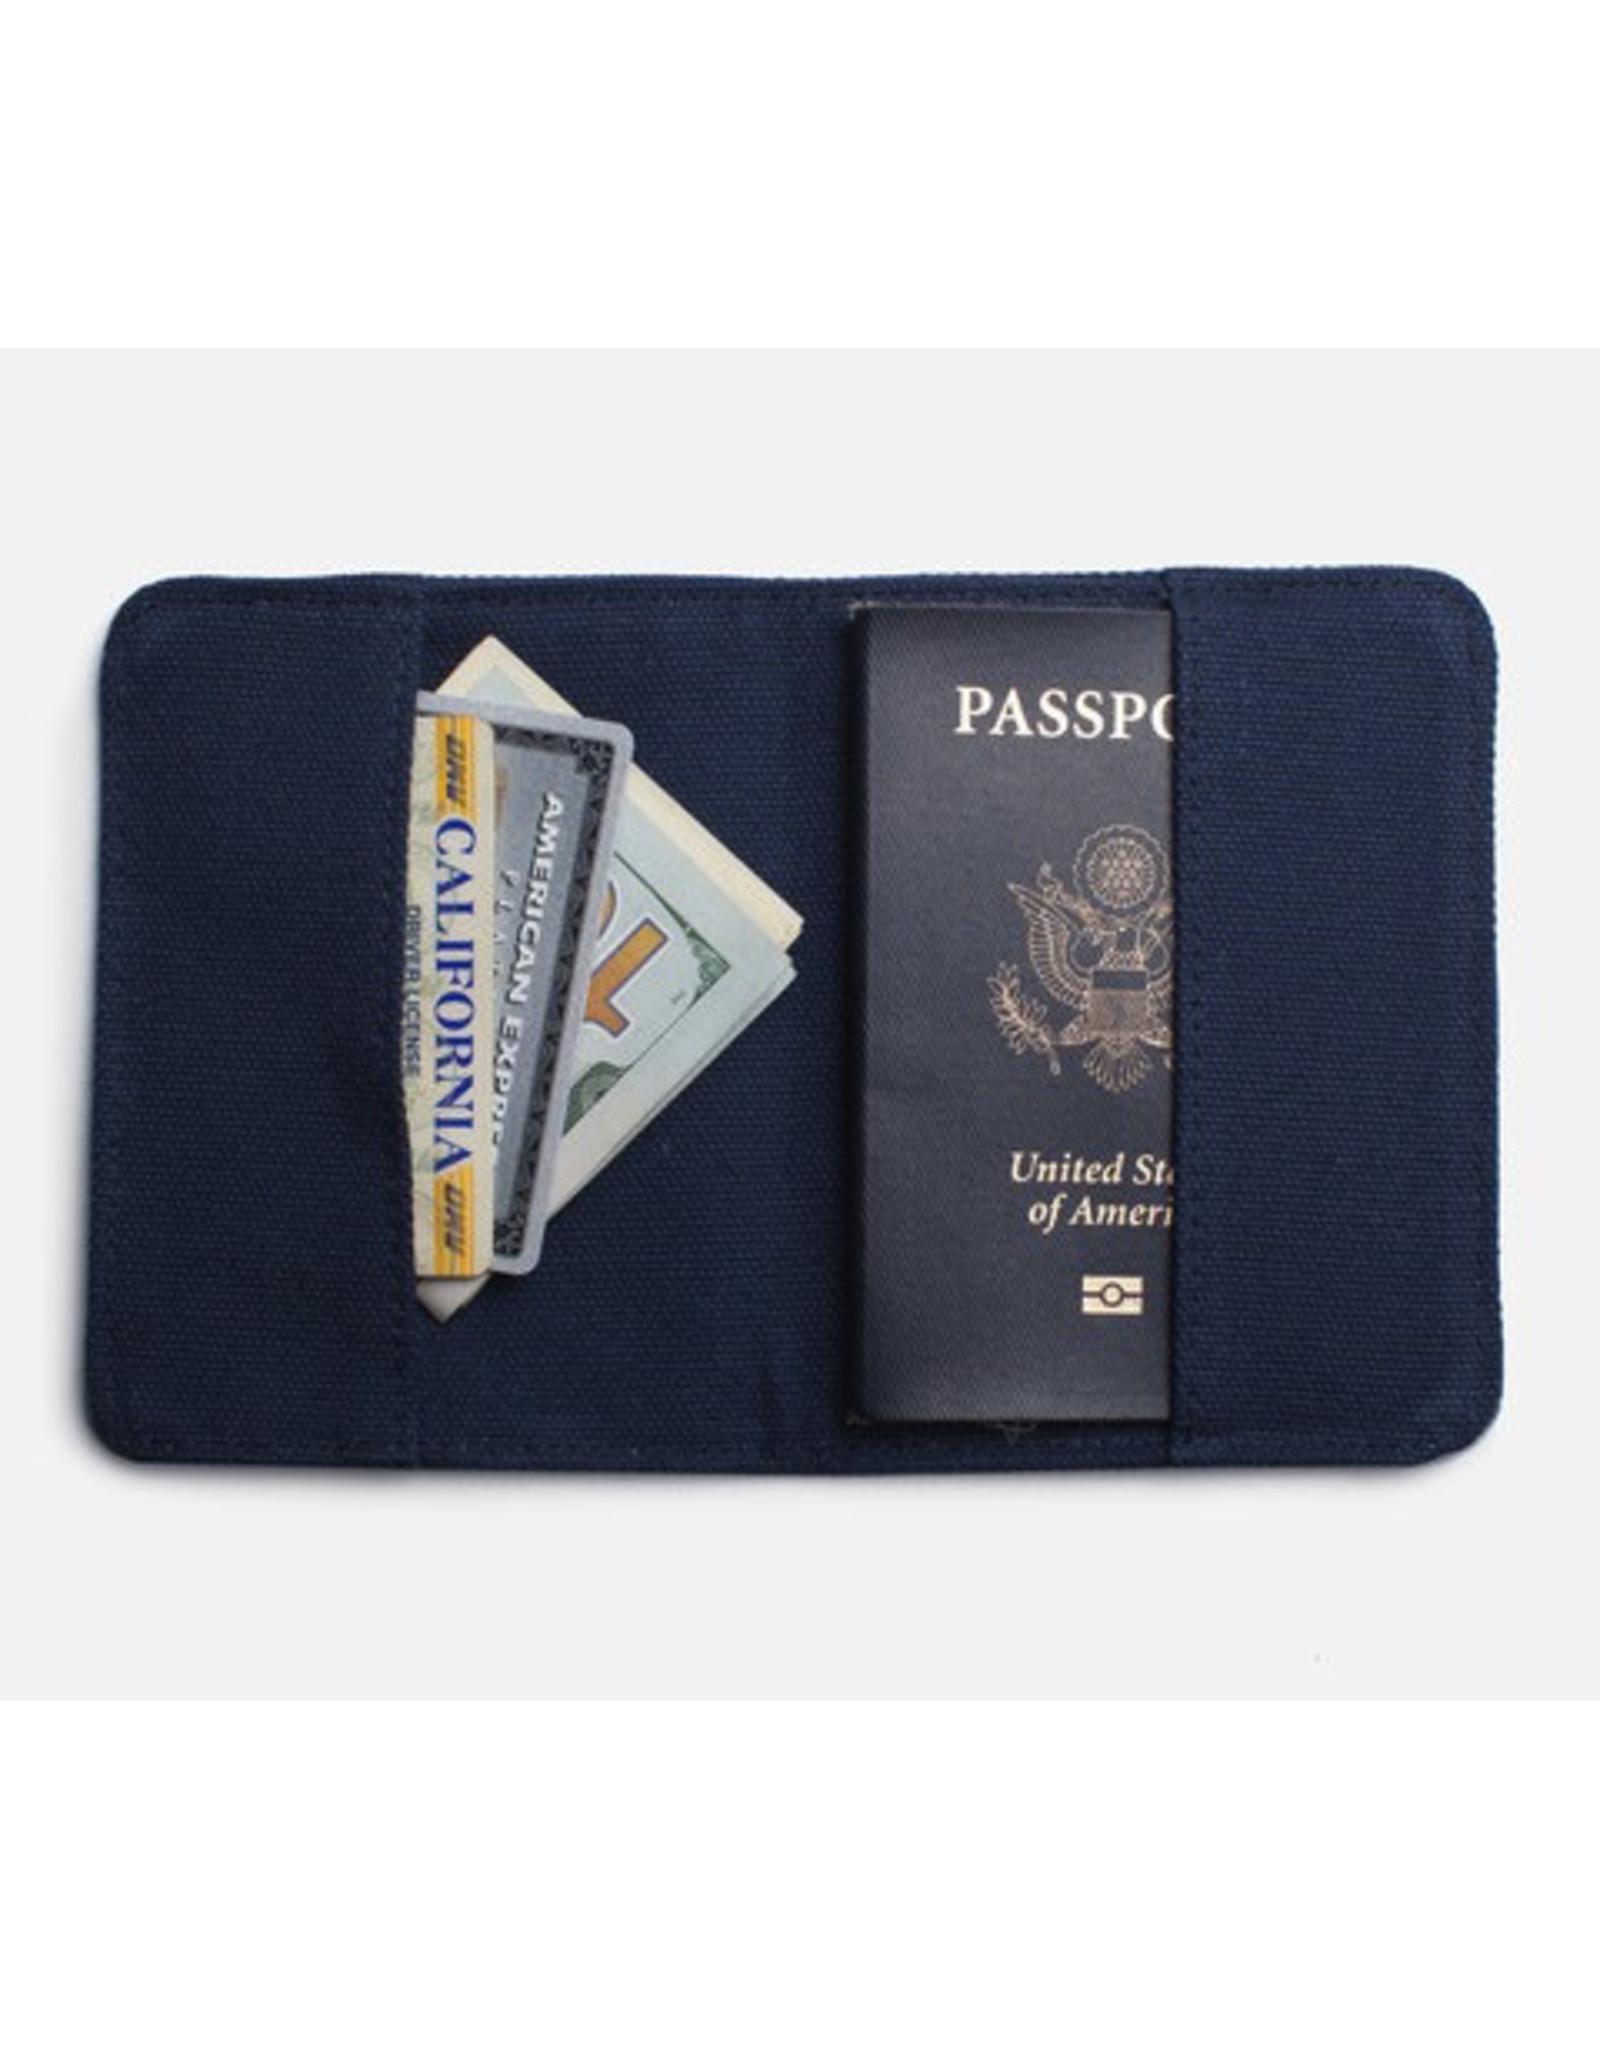 PASSPORT HOLDER BOARDING